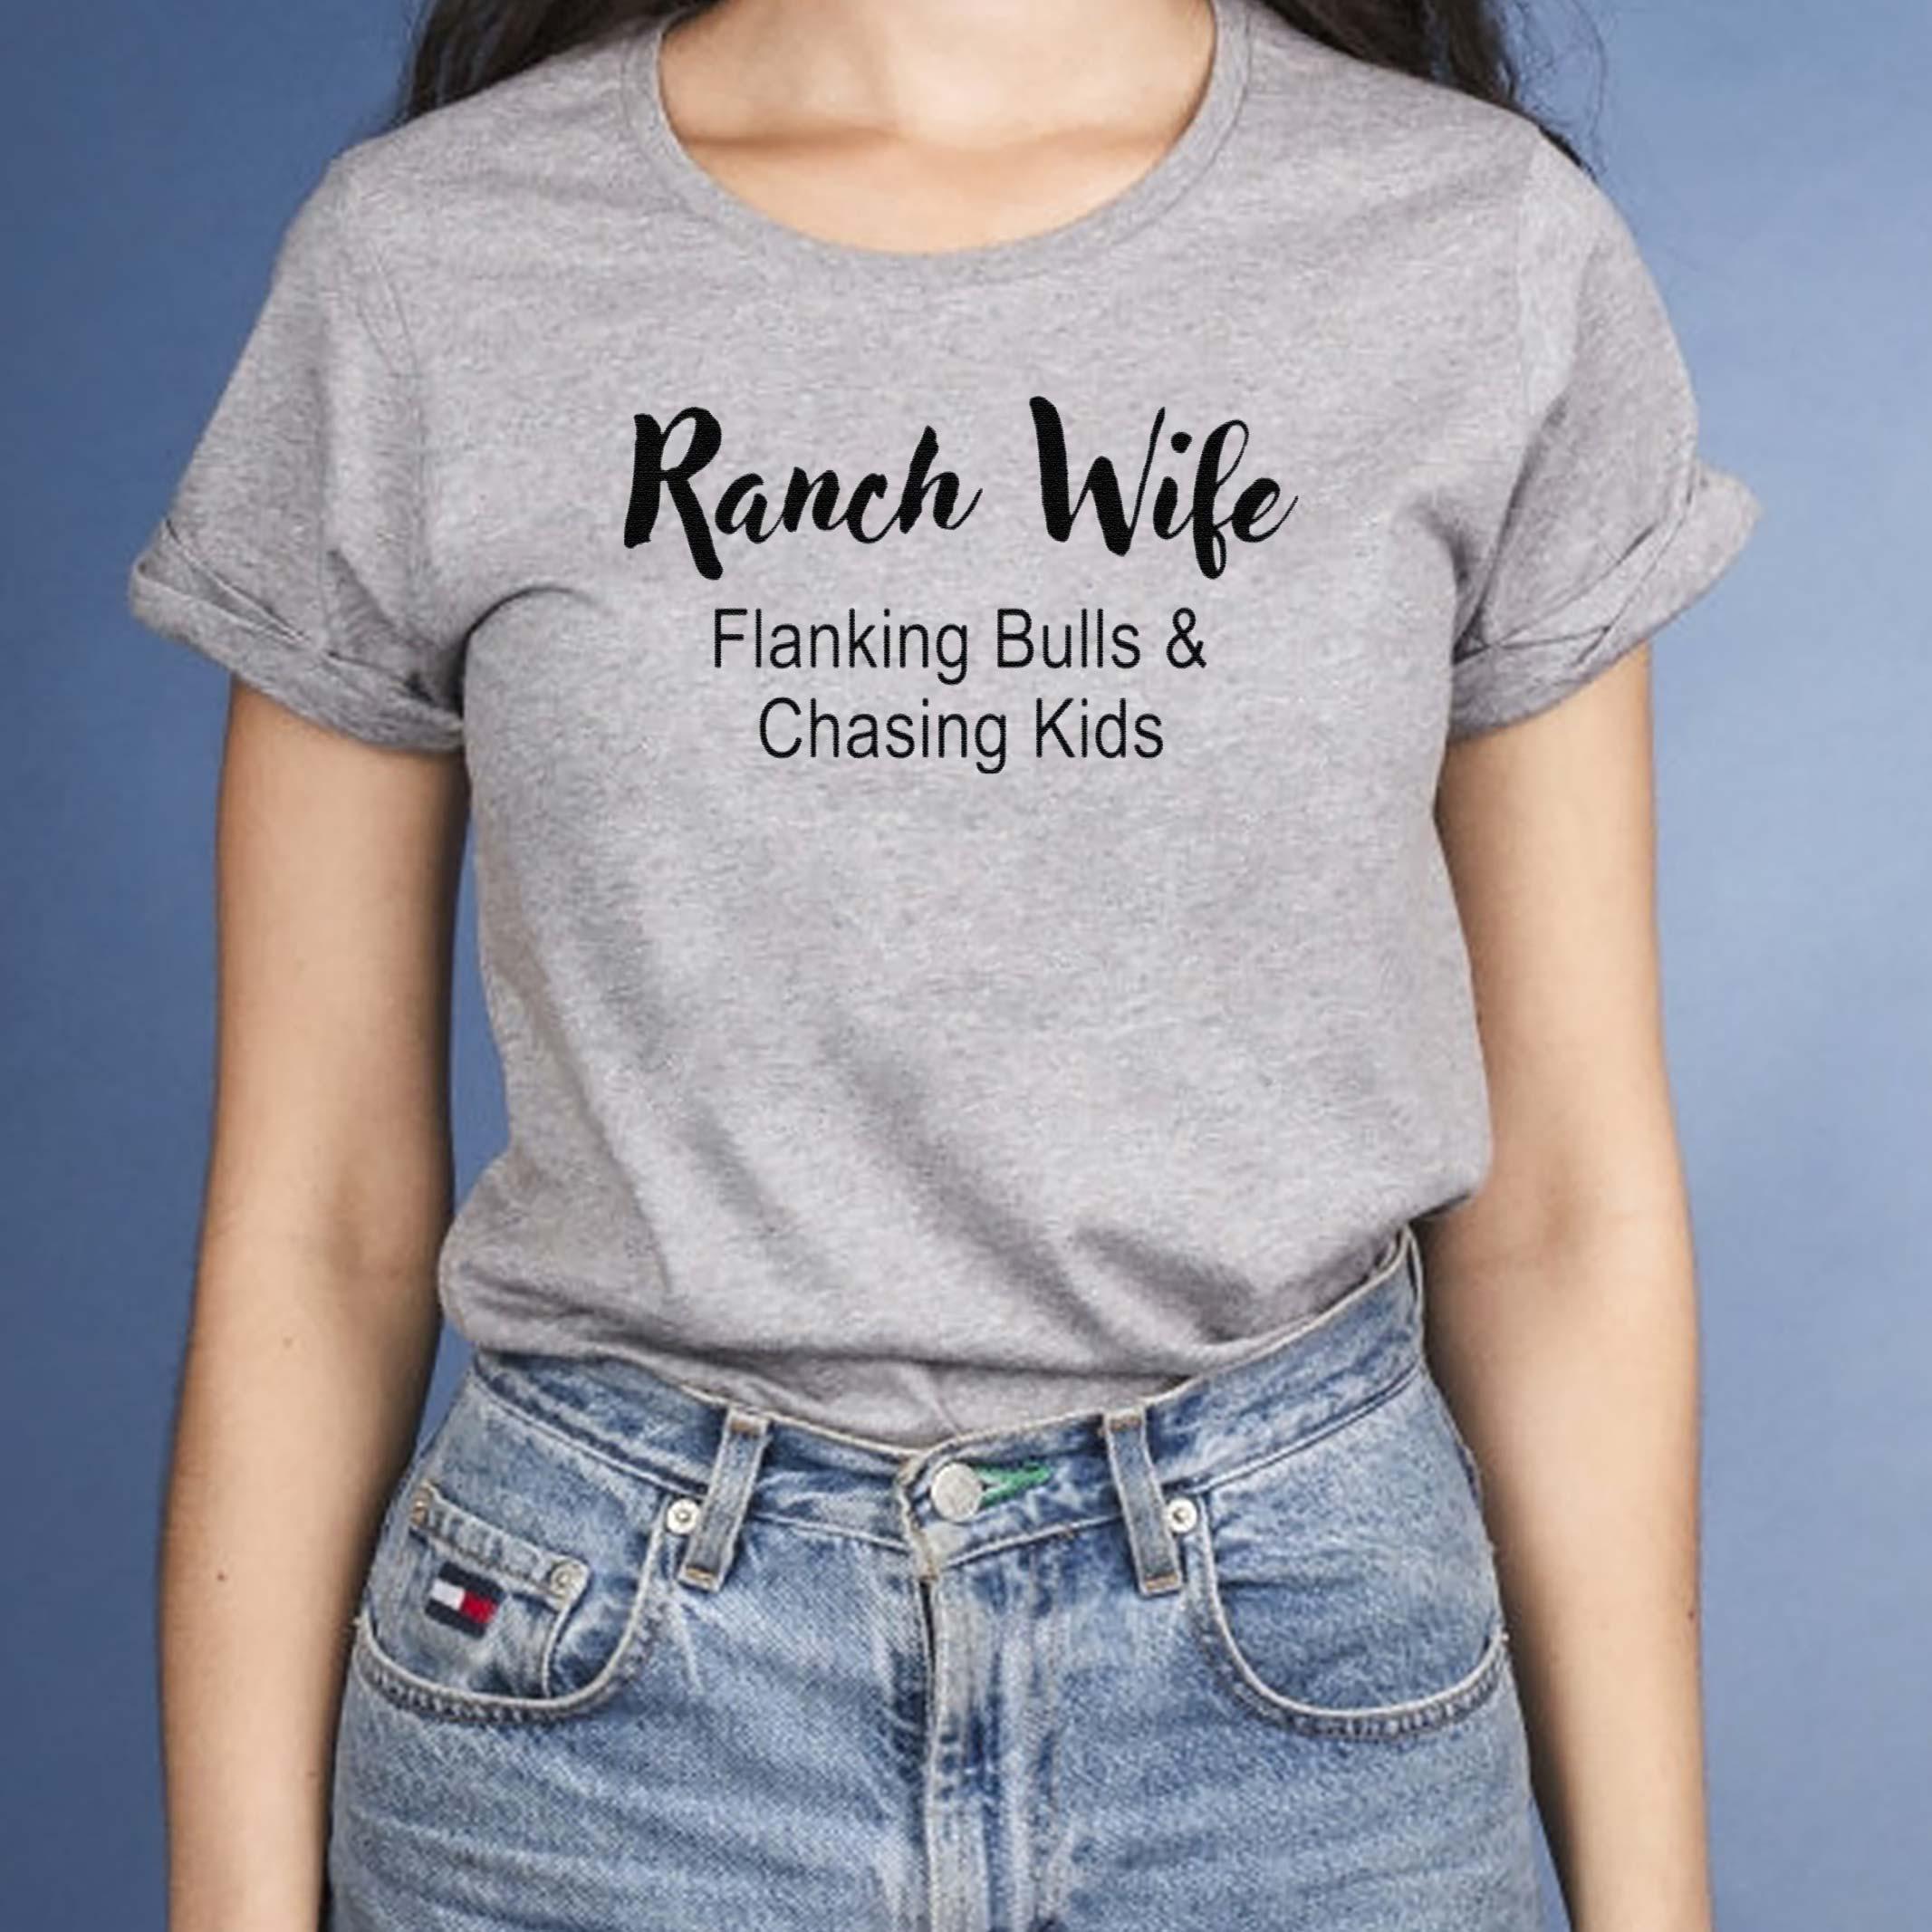 Ranch-Wife-Flanking-Bulls-Chasing-Kids-shirts